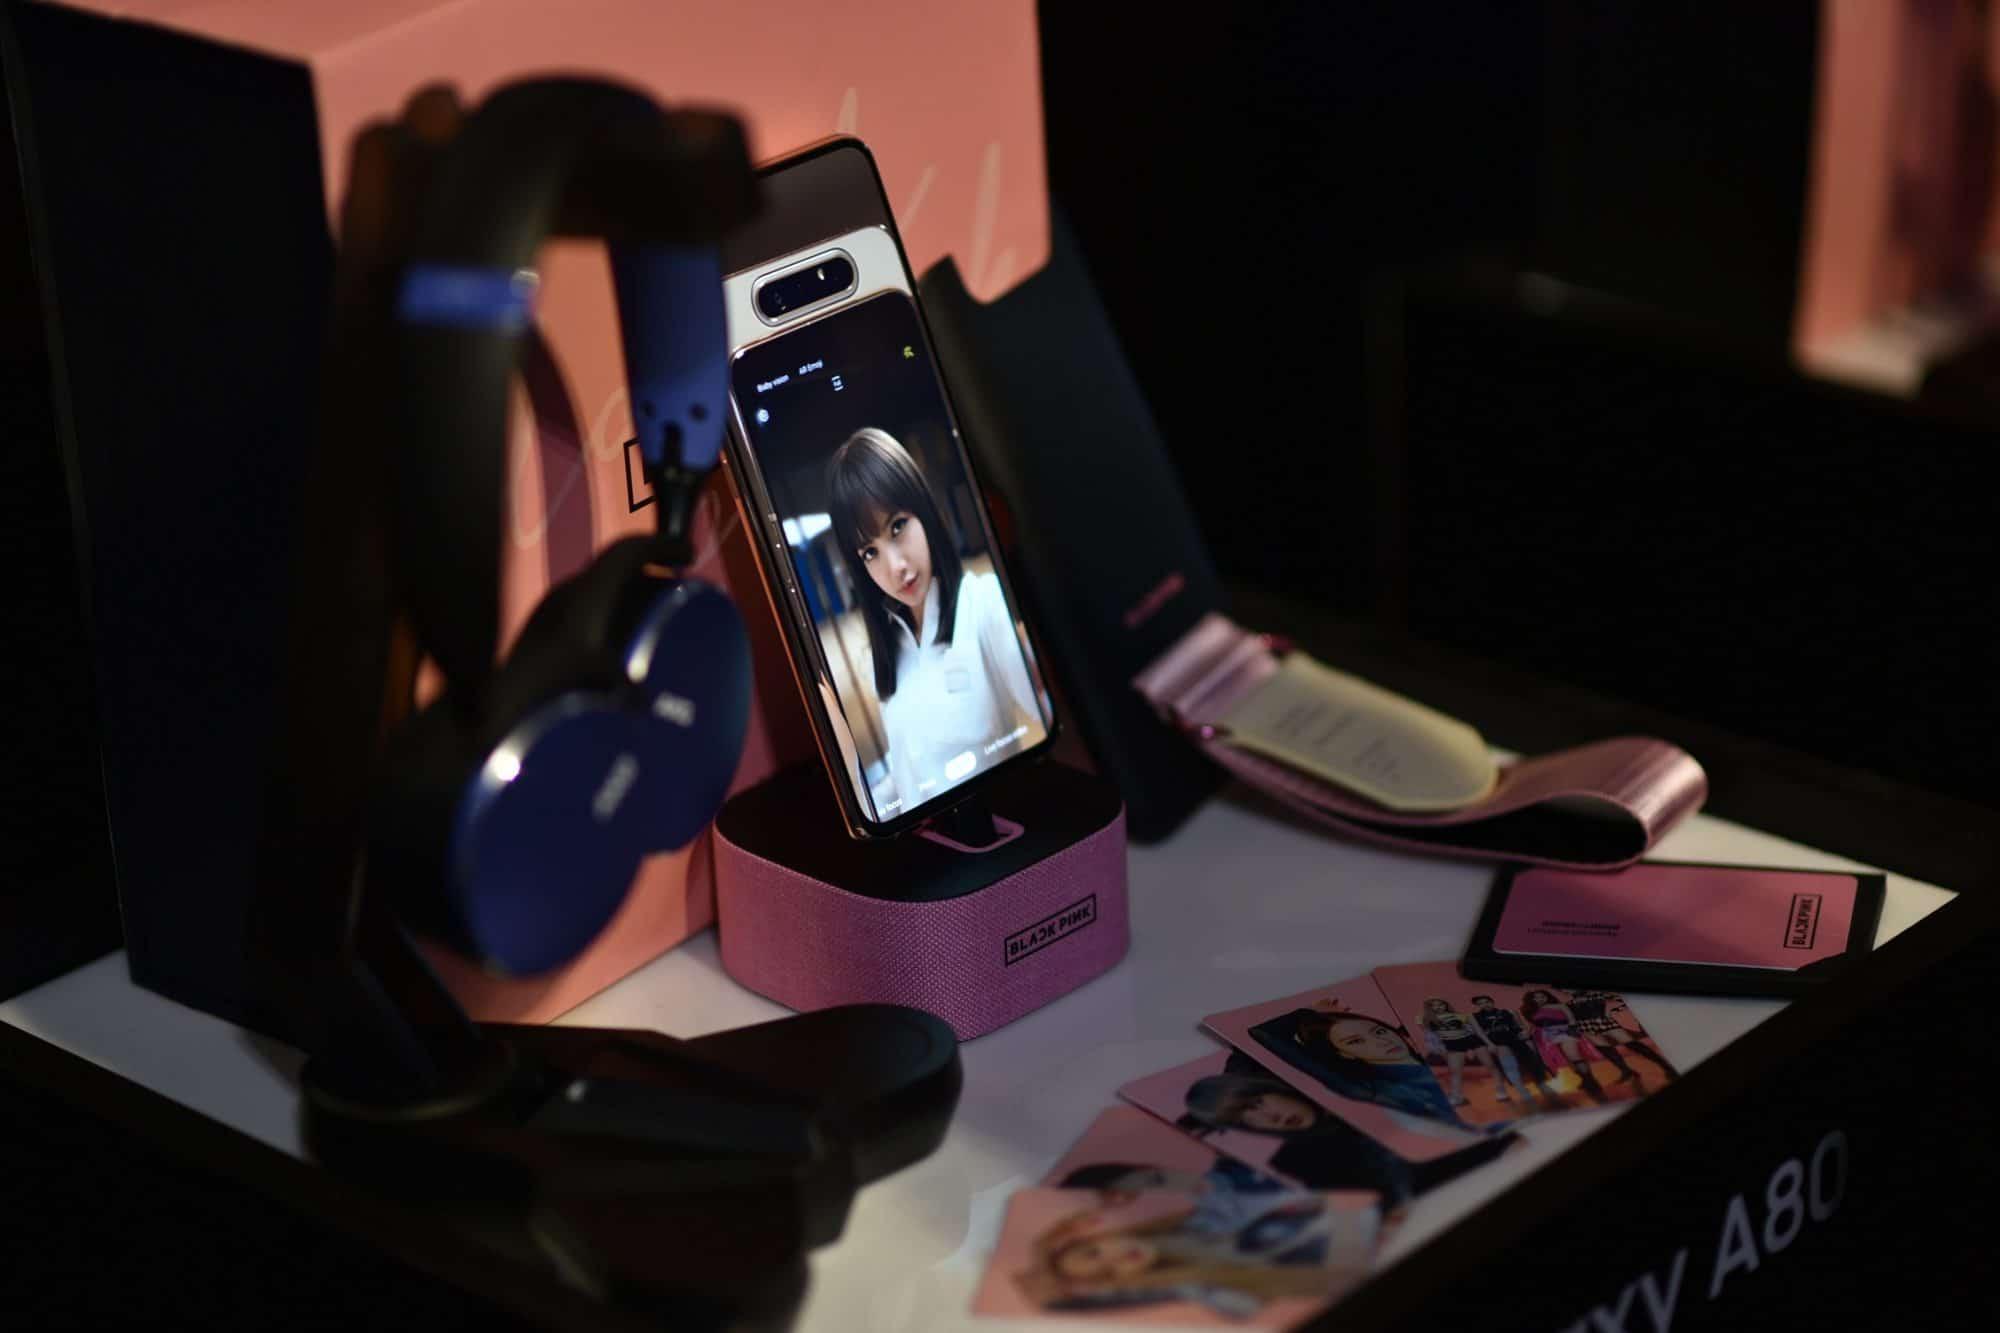 Samsung เปิดจอง Galaxy A80 กล้องหมุนในไทย ราคา 21,990.- พรีออเดอร์รับเซ็ต Blackpink สุดลิมิเต็ด 4